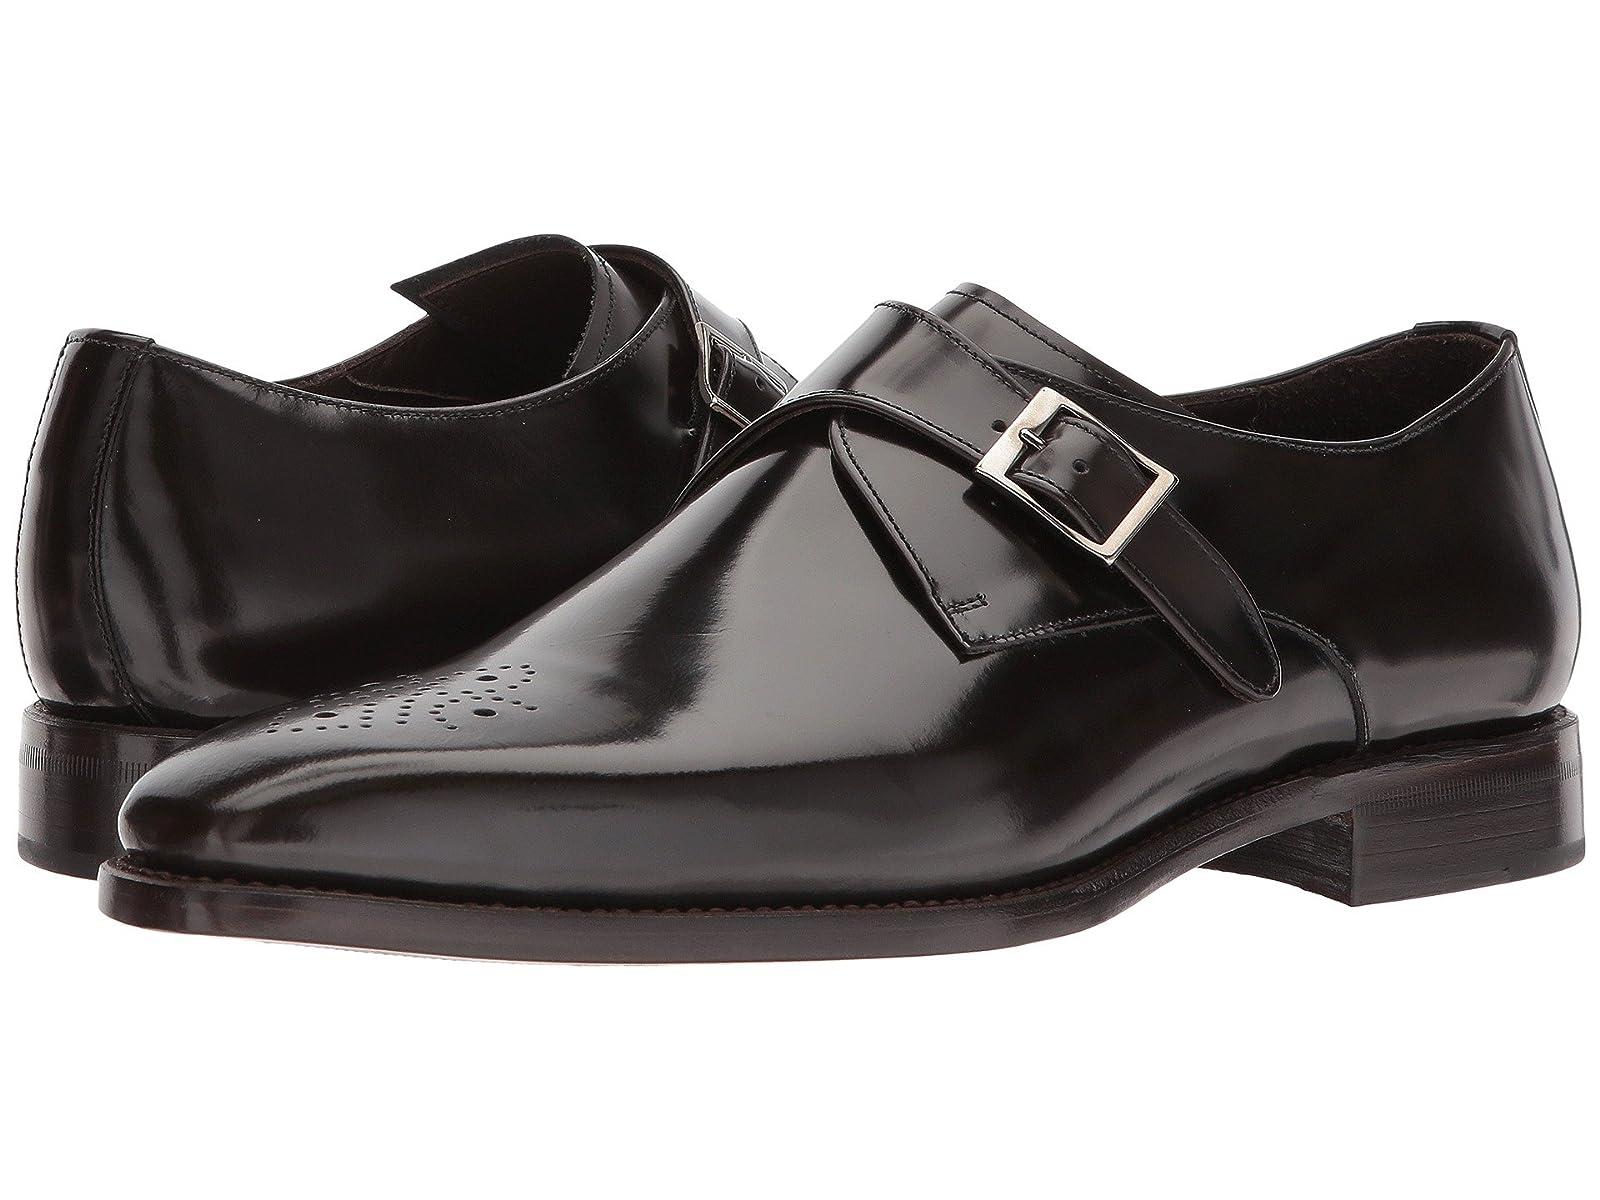 CARLOS by Carlos Santana PuenteAtmospheric grades have affordable shoes